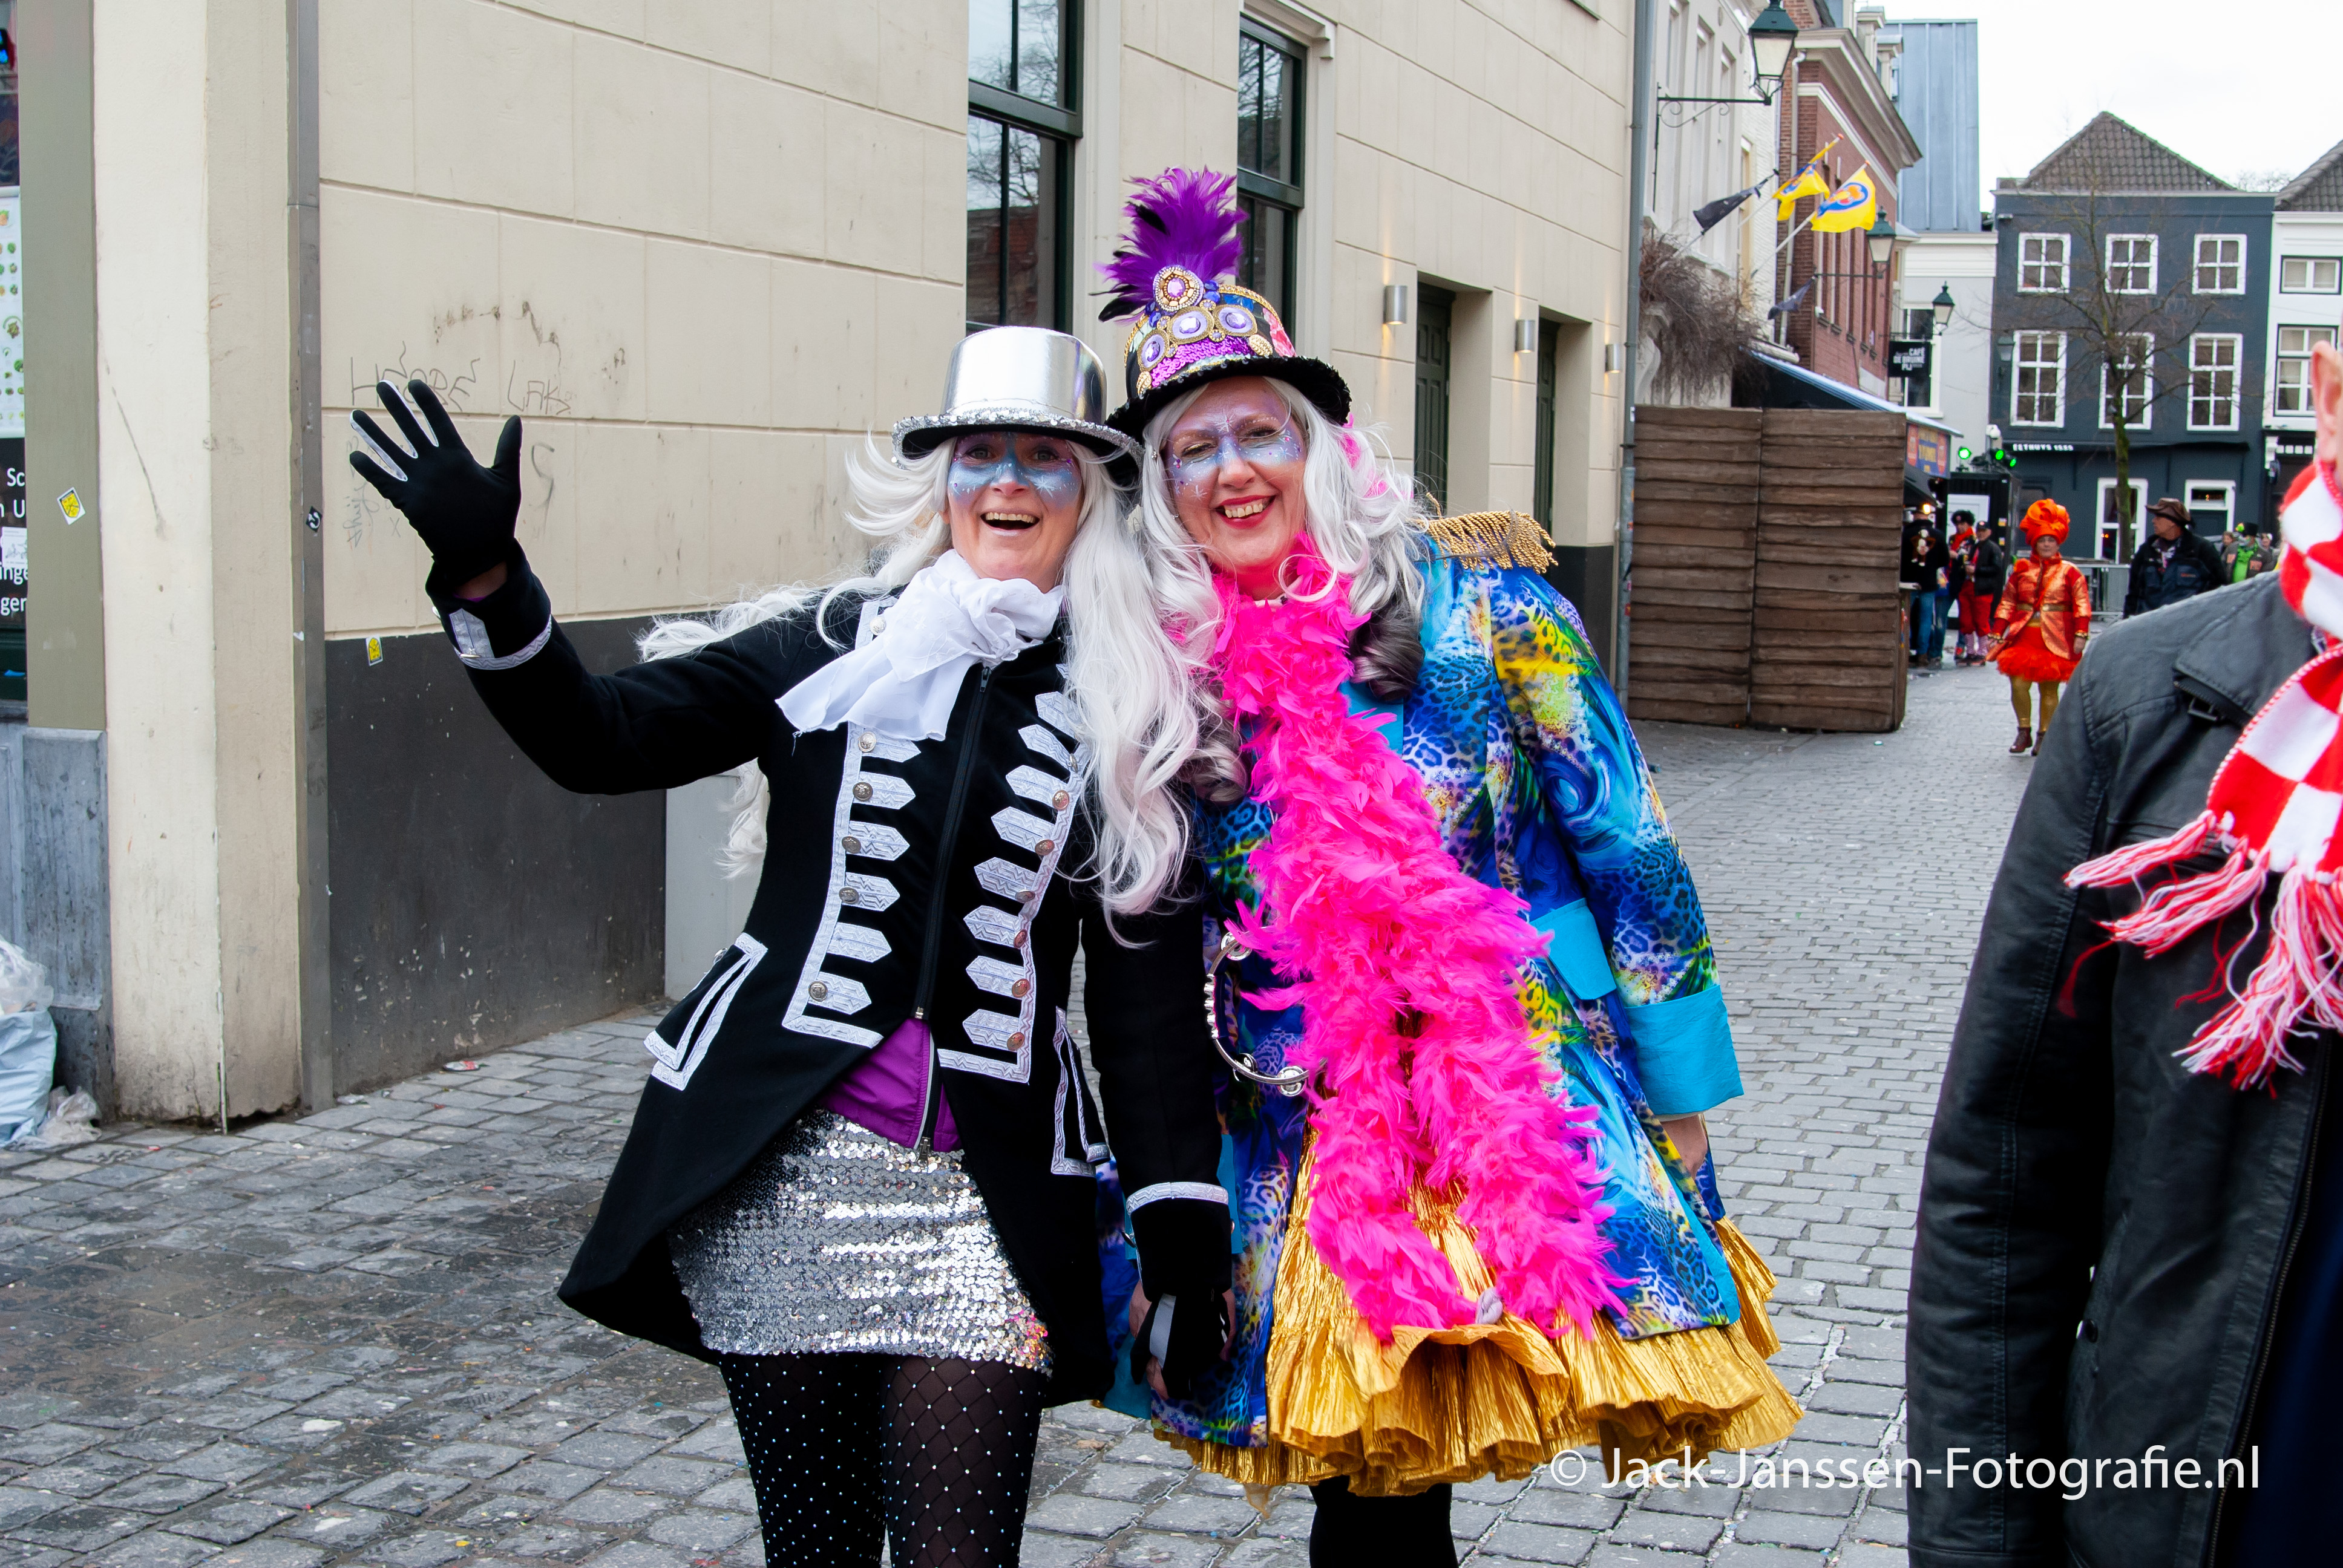 Halloween Party Breda.Breda Carnaval 2019 Dag 3 20 Breda